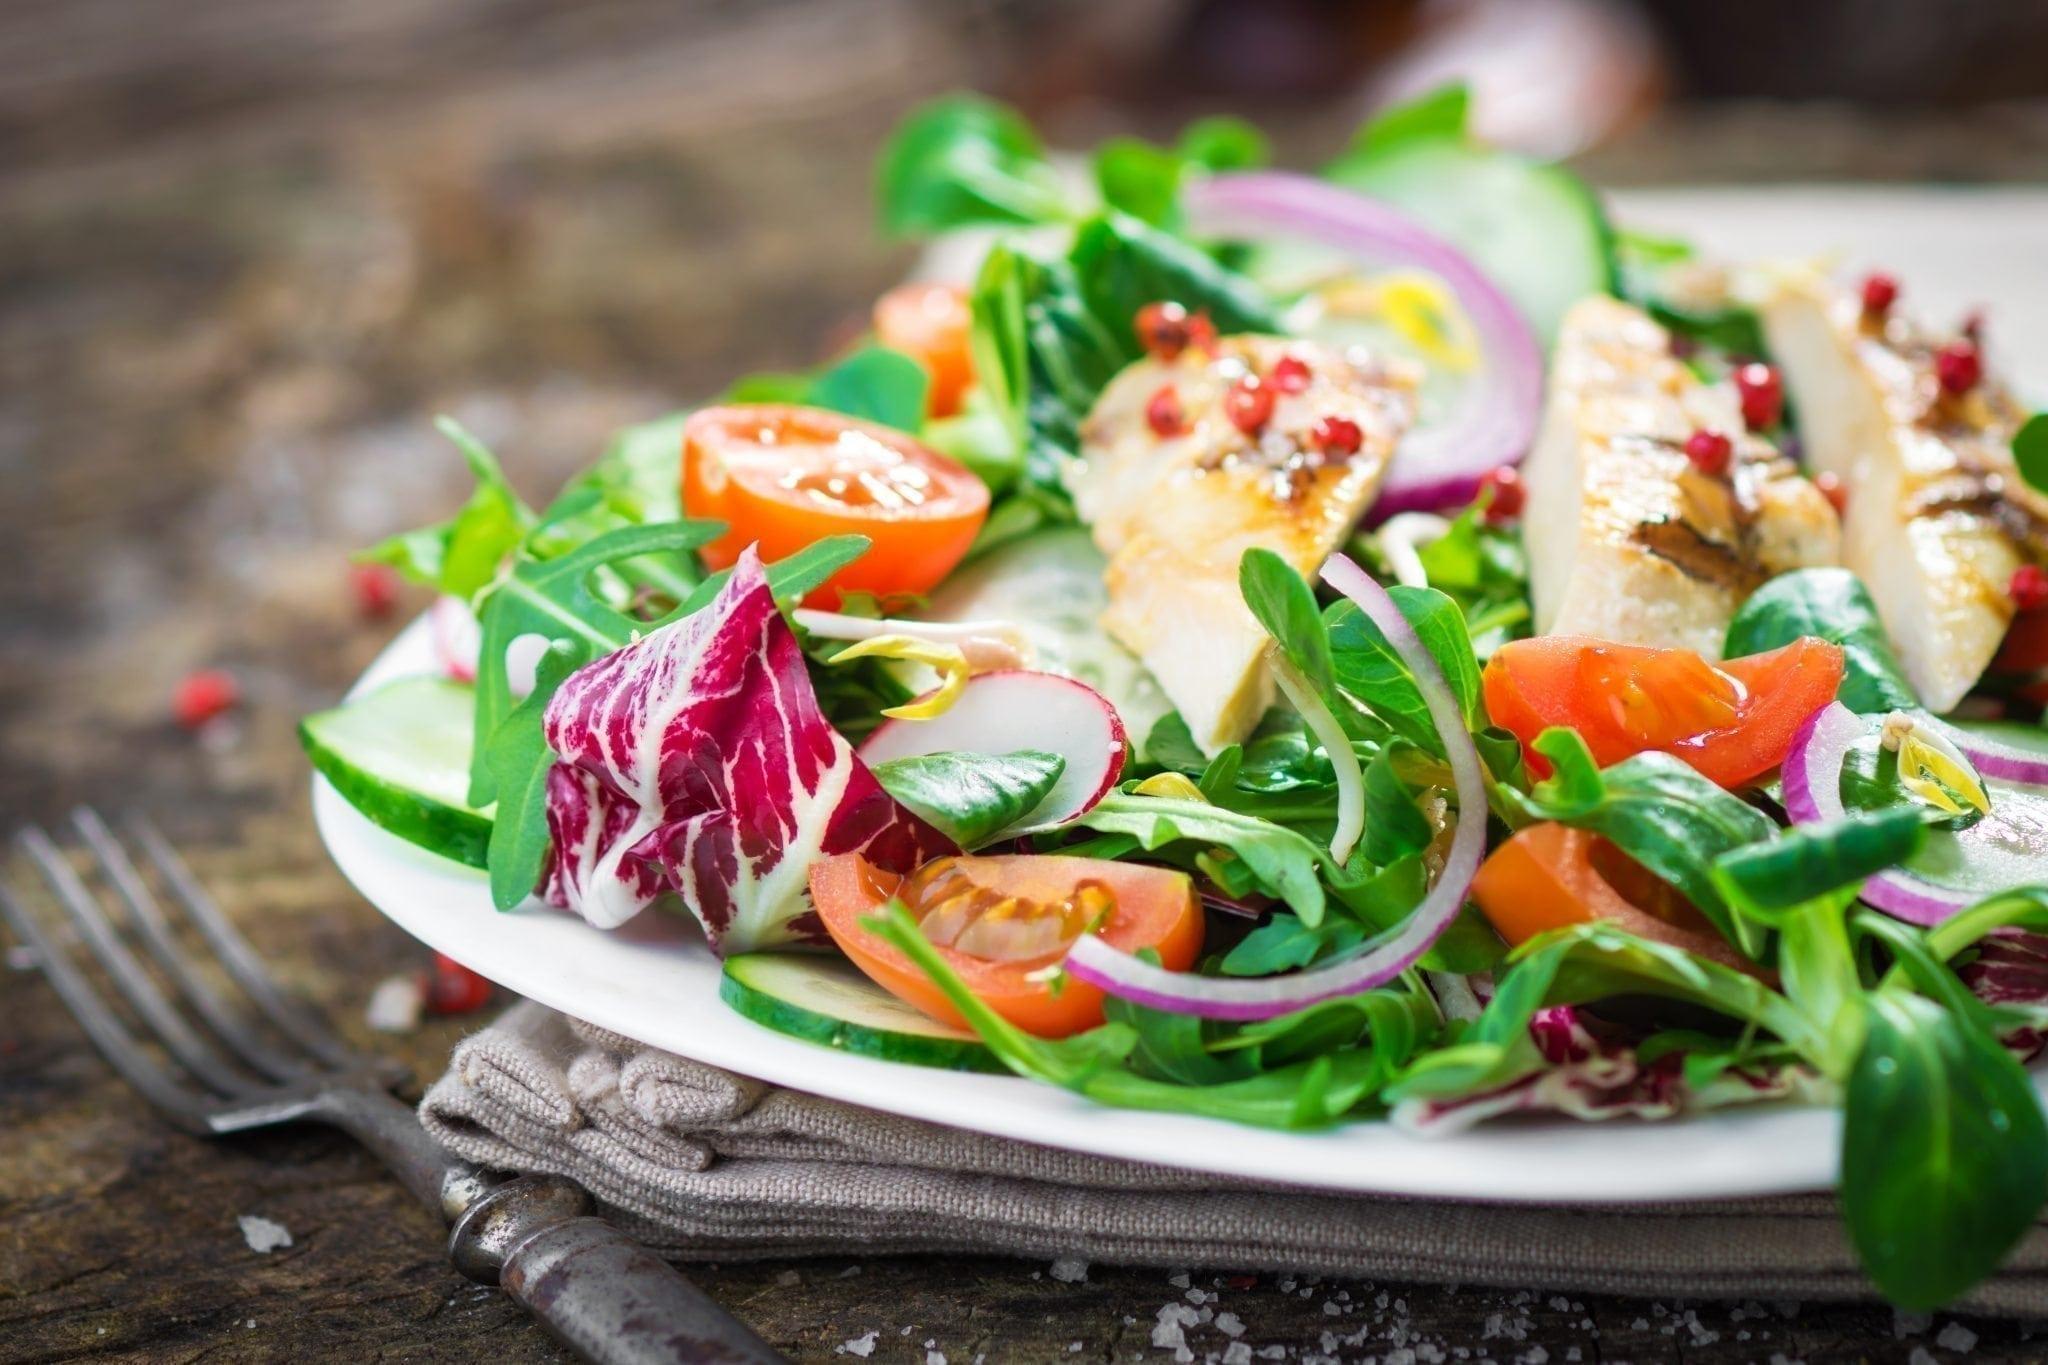 15 Healthier Fast Food Meals Under 500 Calories